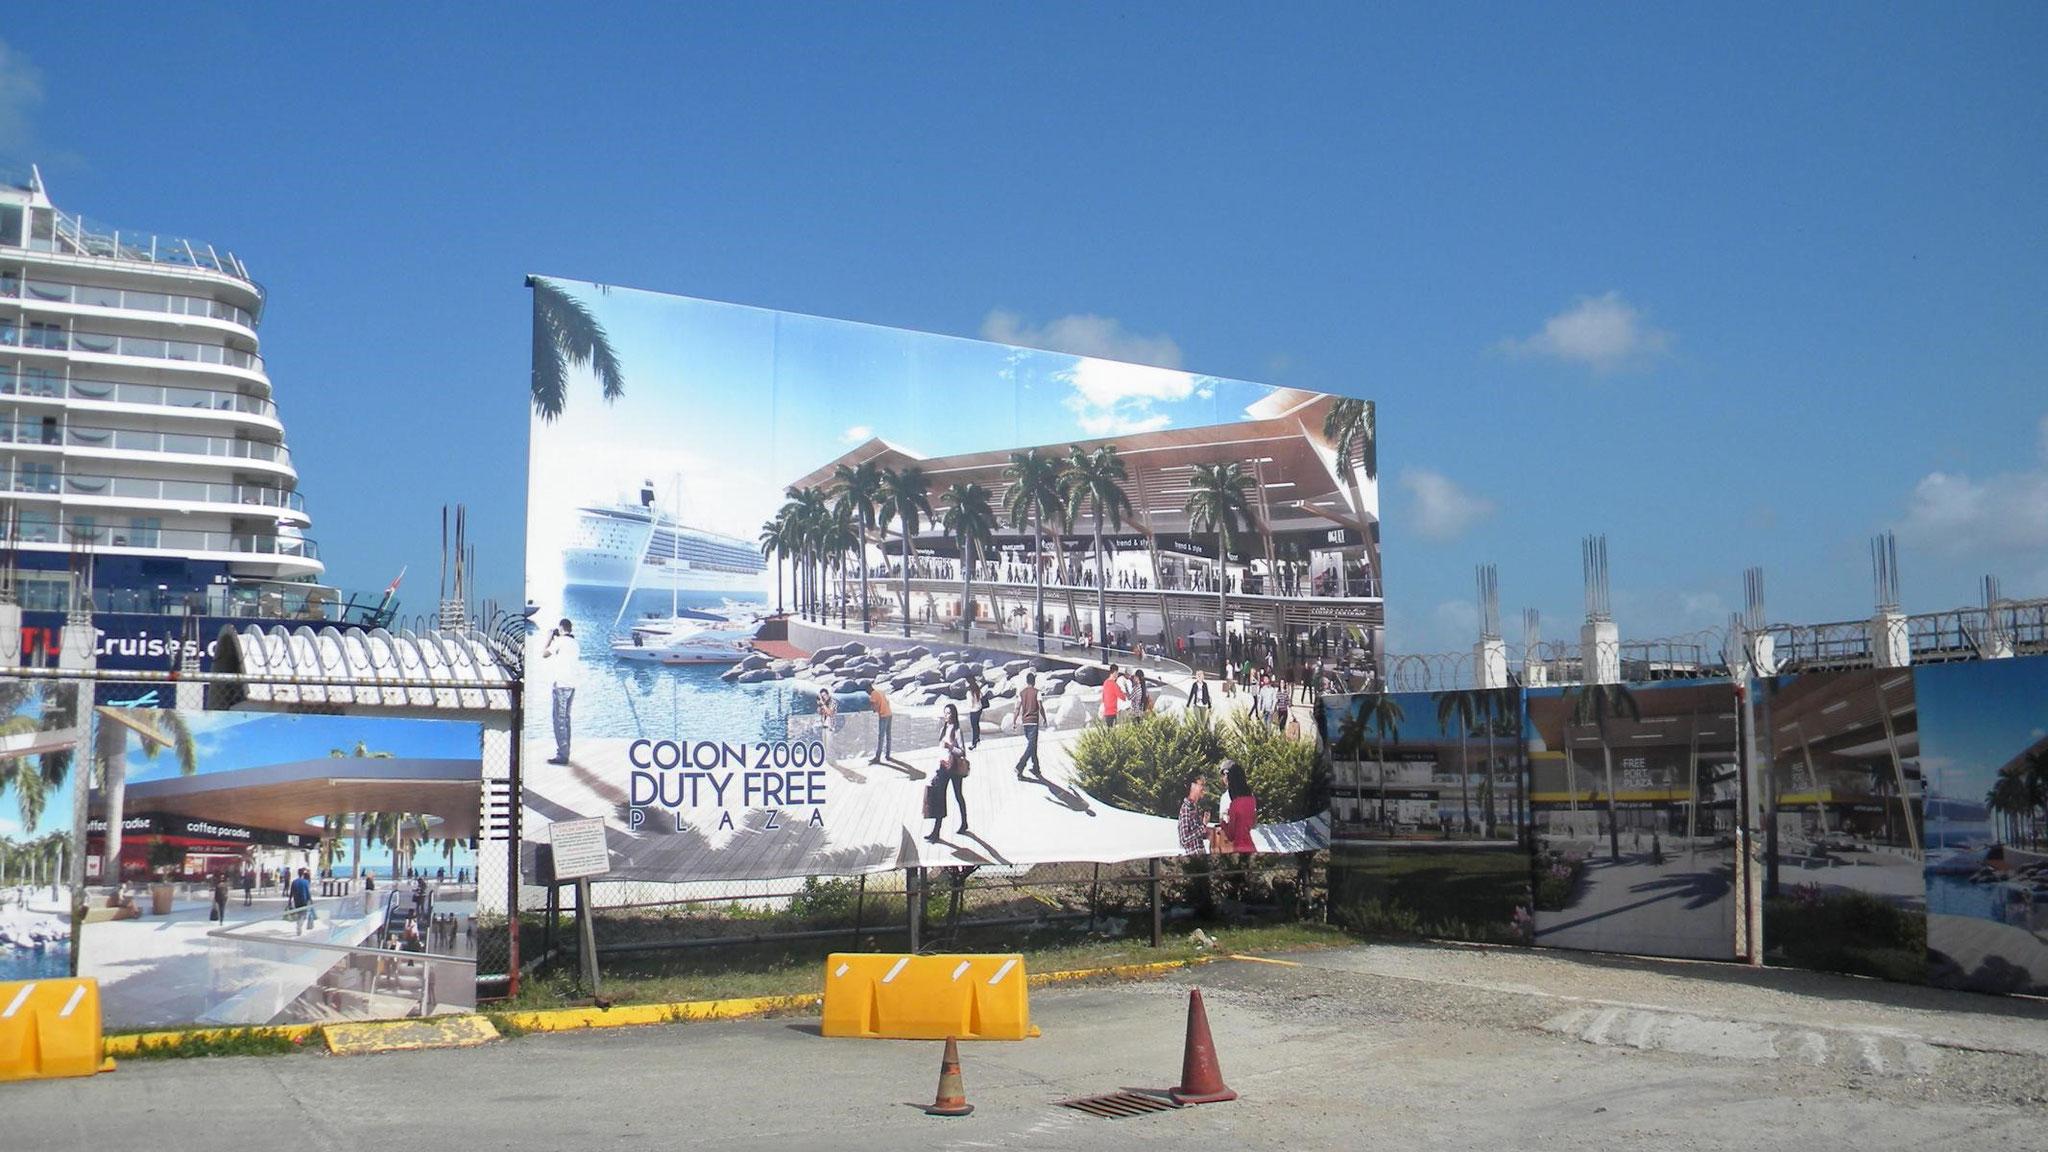 Baustelle neben dem Colón 2000 Cruise Terminal